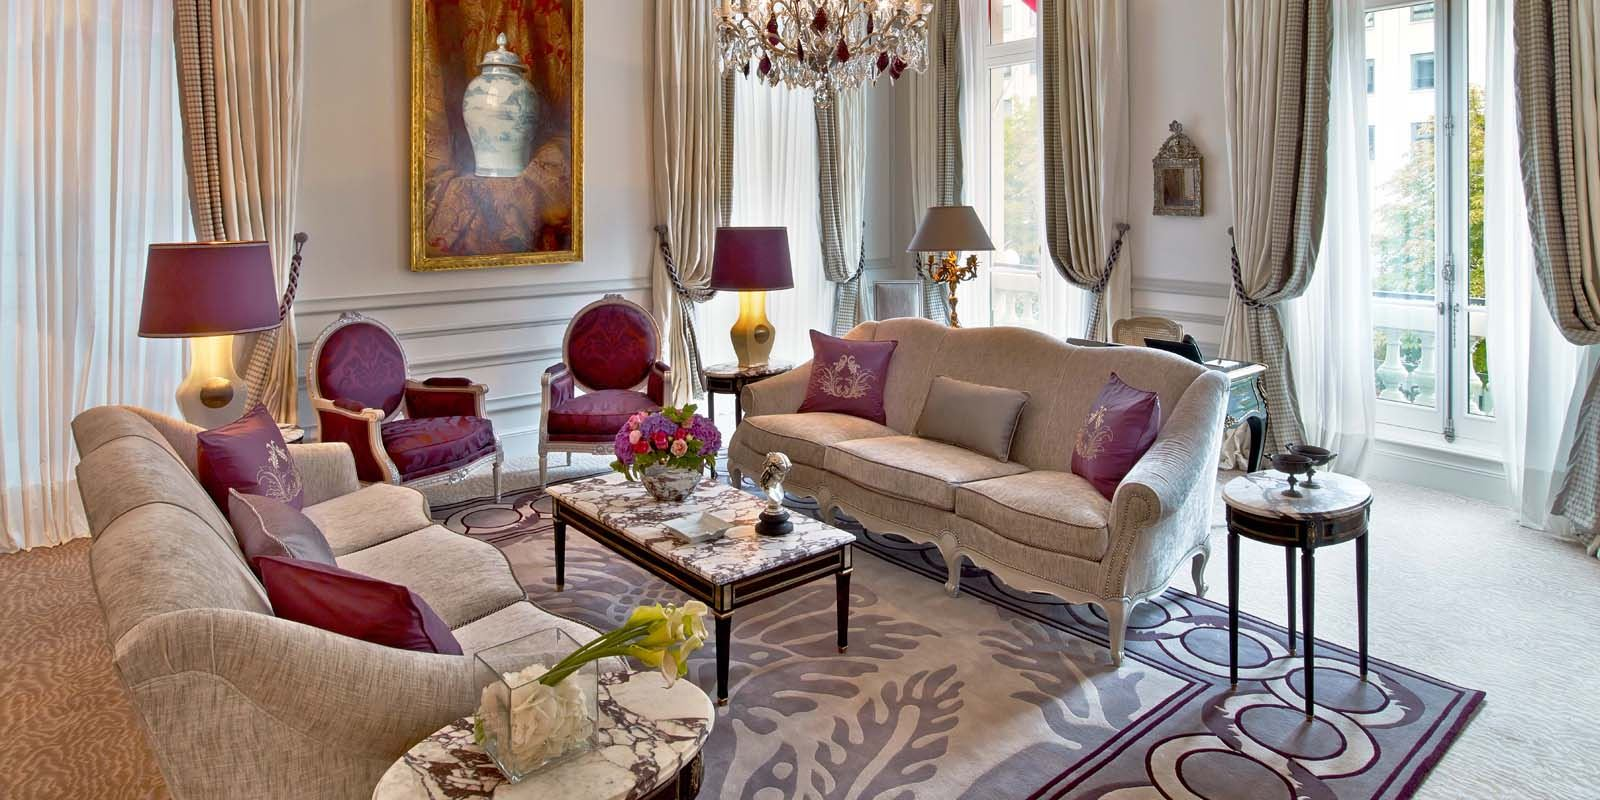 Hotel-Plaza-Athenee-Suite-Prestige-215-216-LR---Eric-Laignel-1